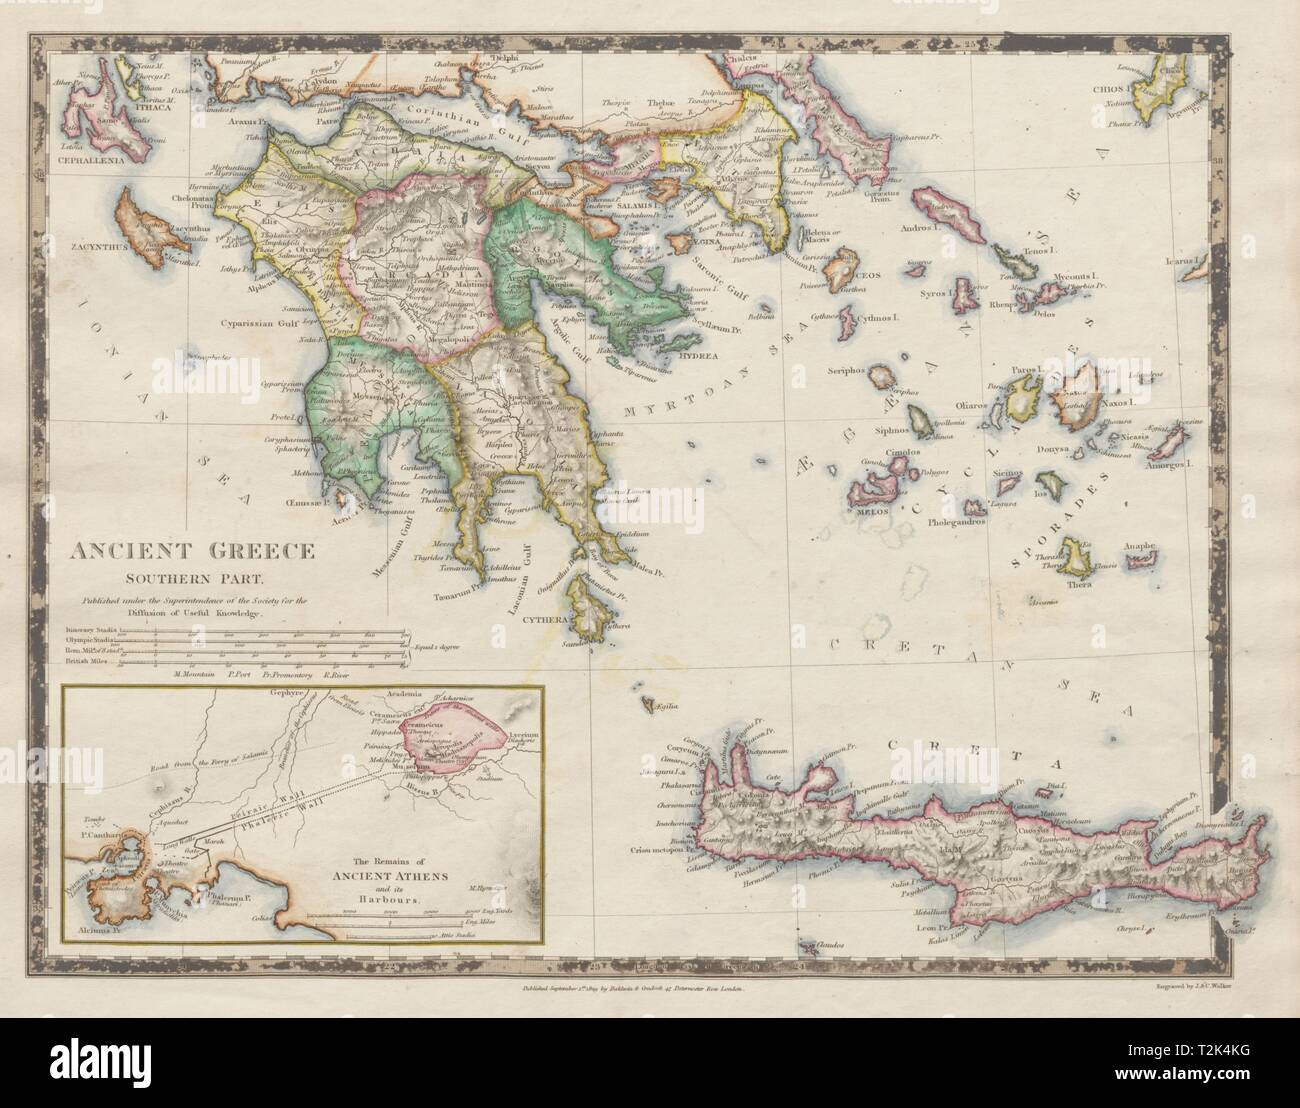 Peloponnes Karte.Antike Griechenland Morea Creta Athen Peloponnes Kykladen Arcadia